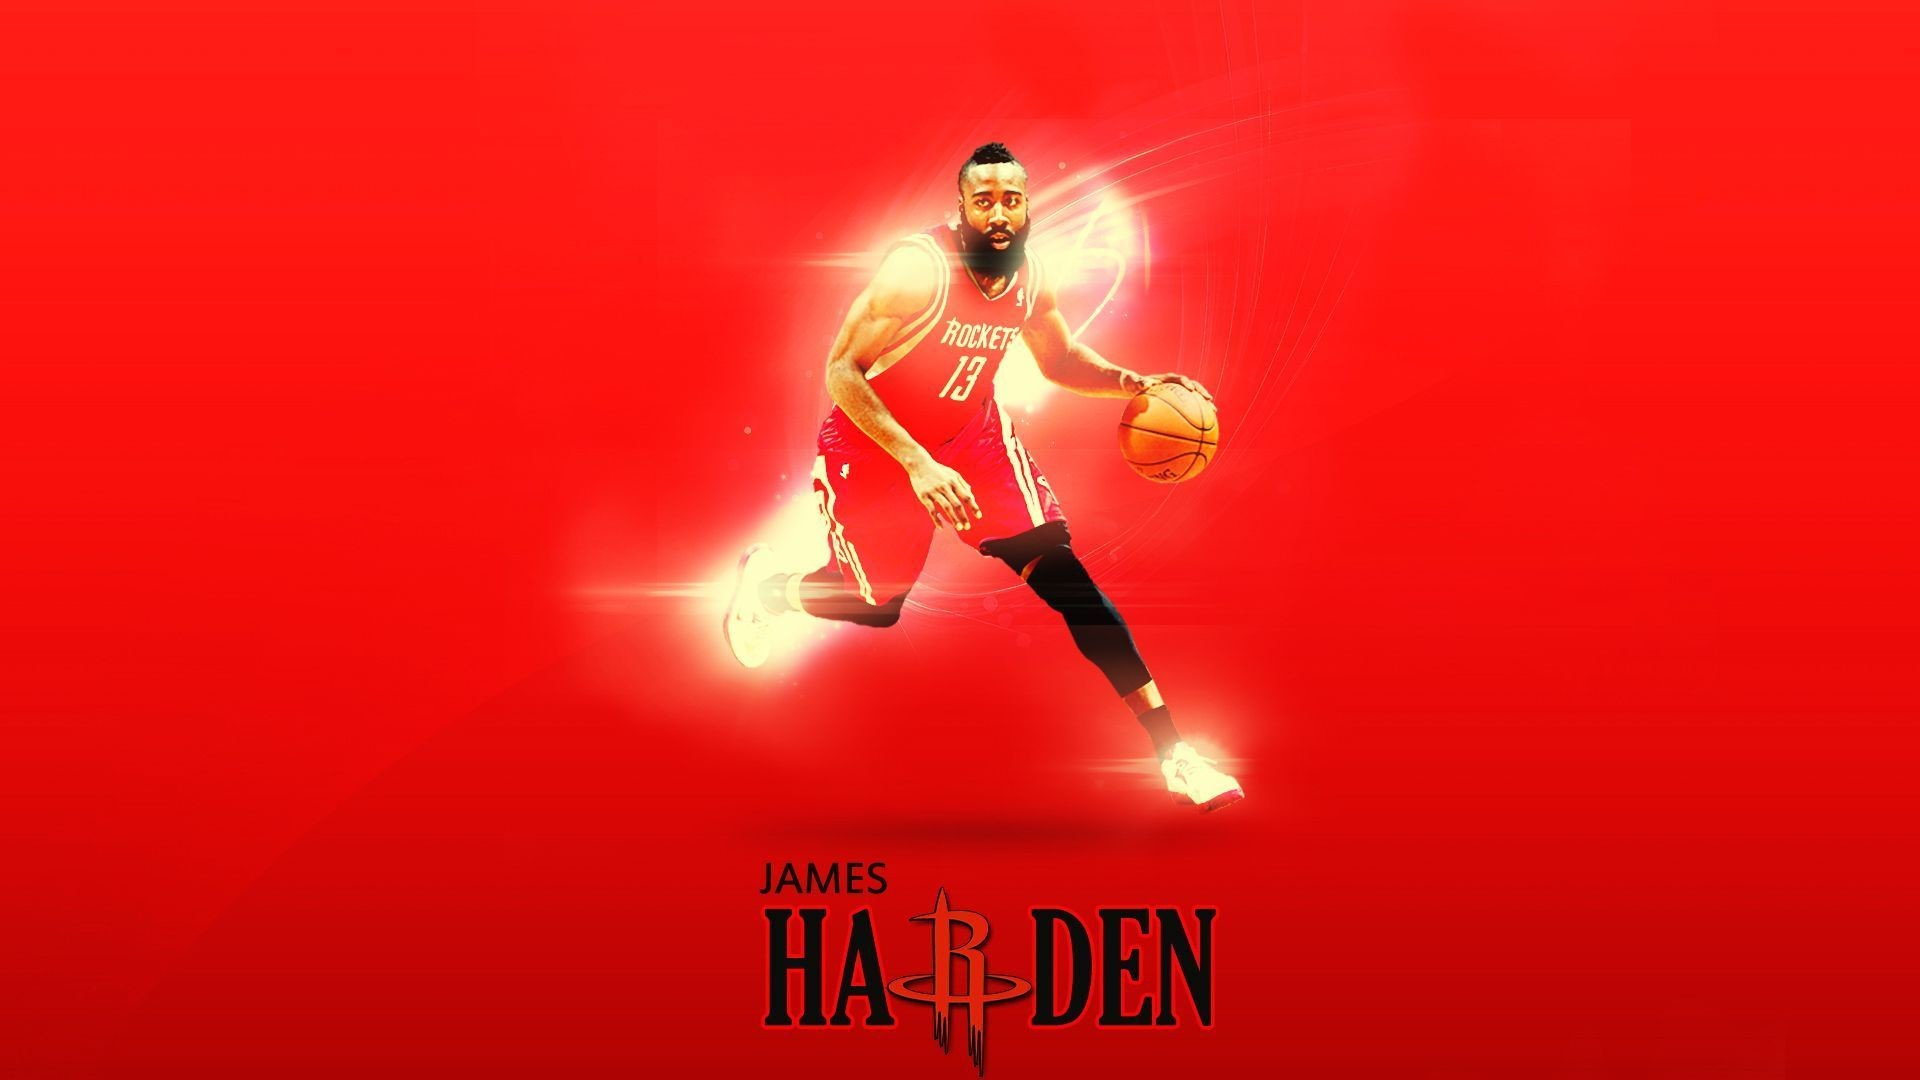 James Harden HD Wallpaper, James Harden Backgrounds